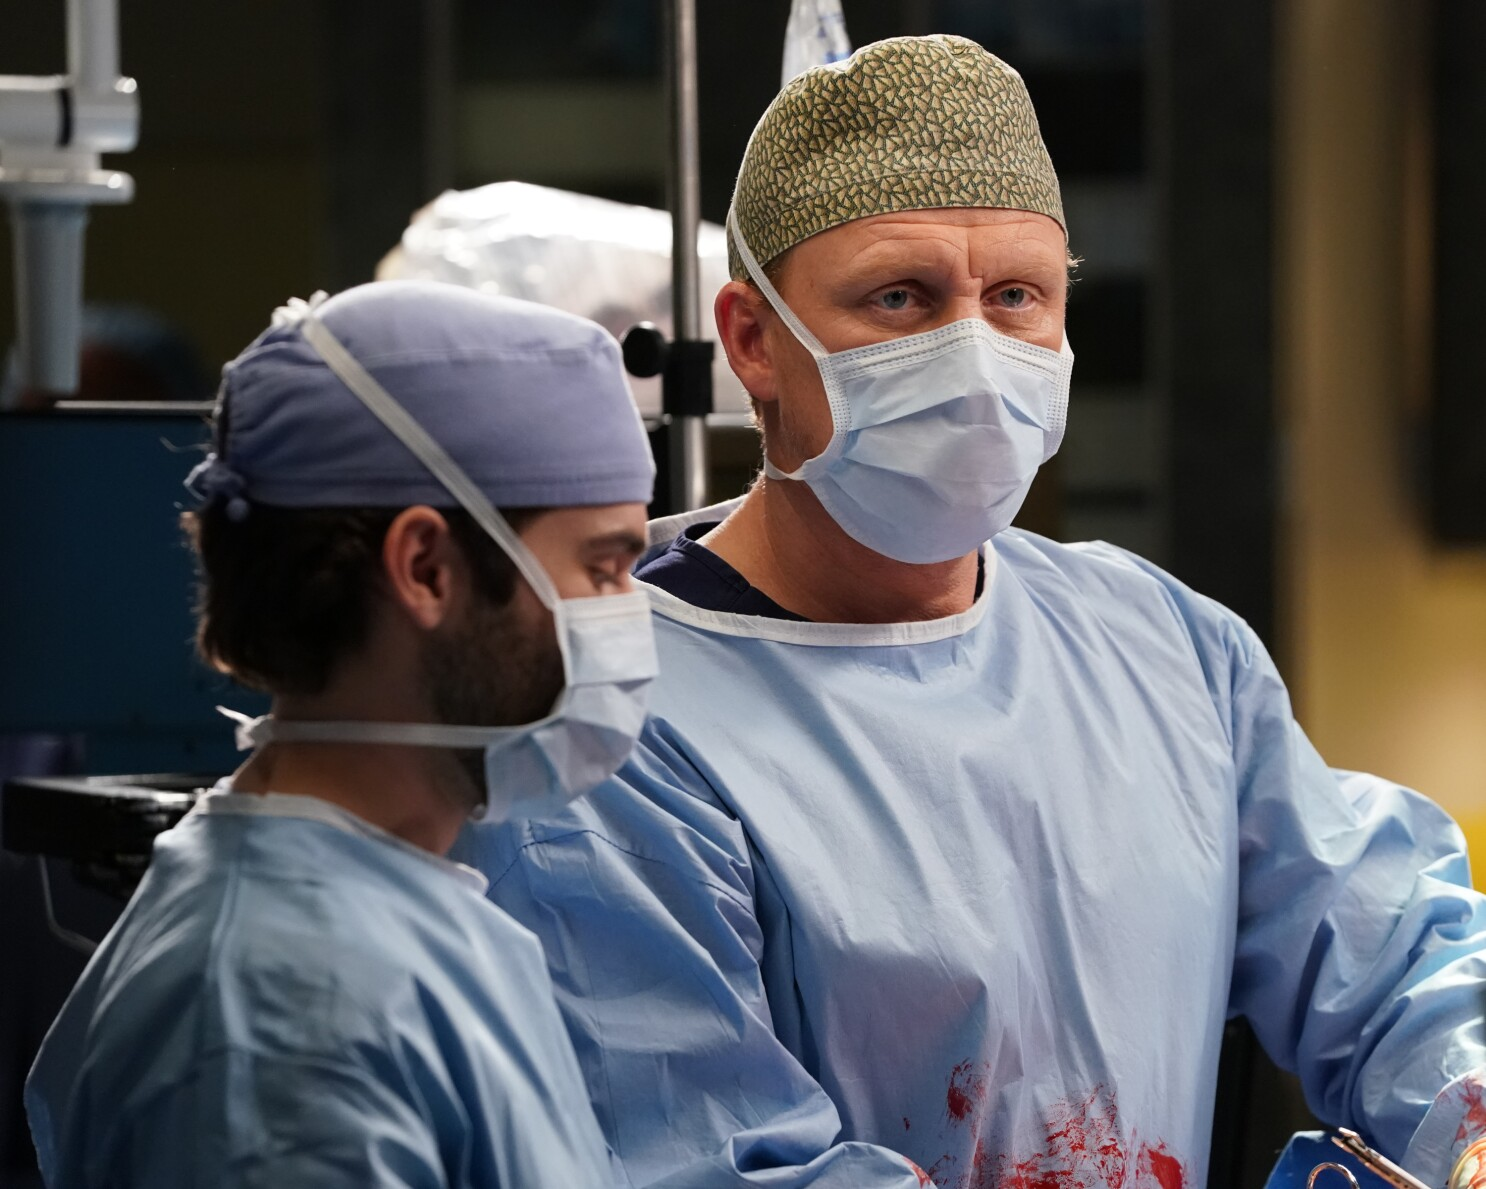 Grey's Anatomy' will explore coronavirus crisis next season - Los ...